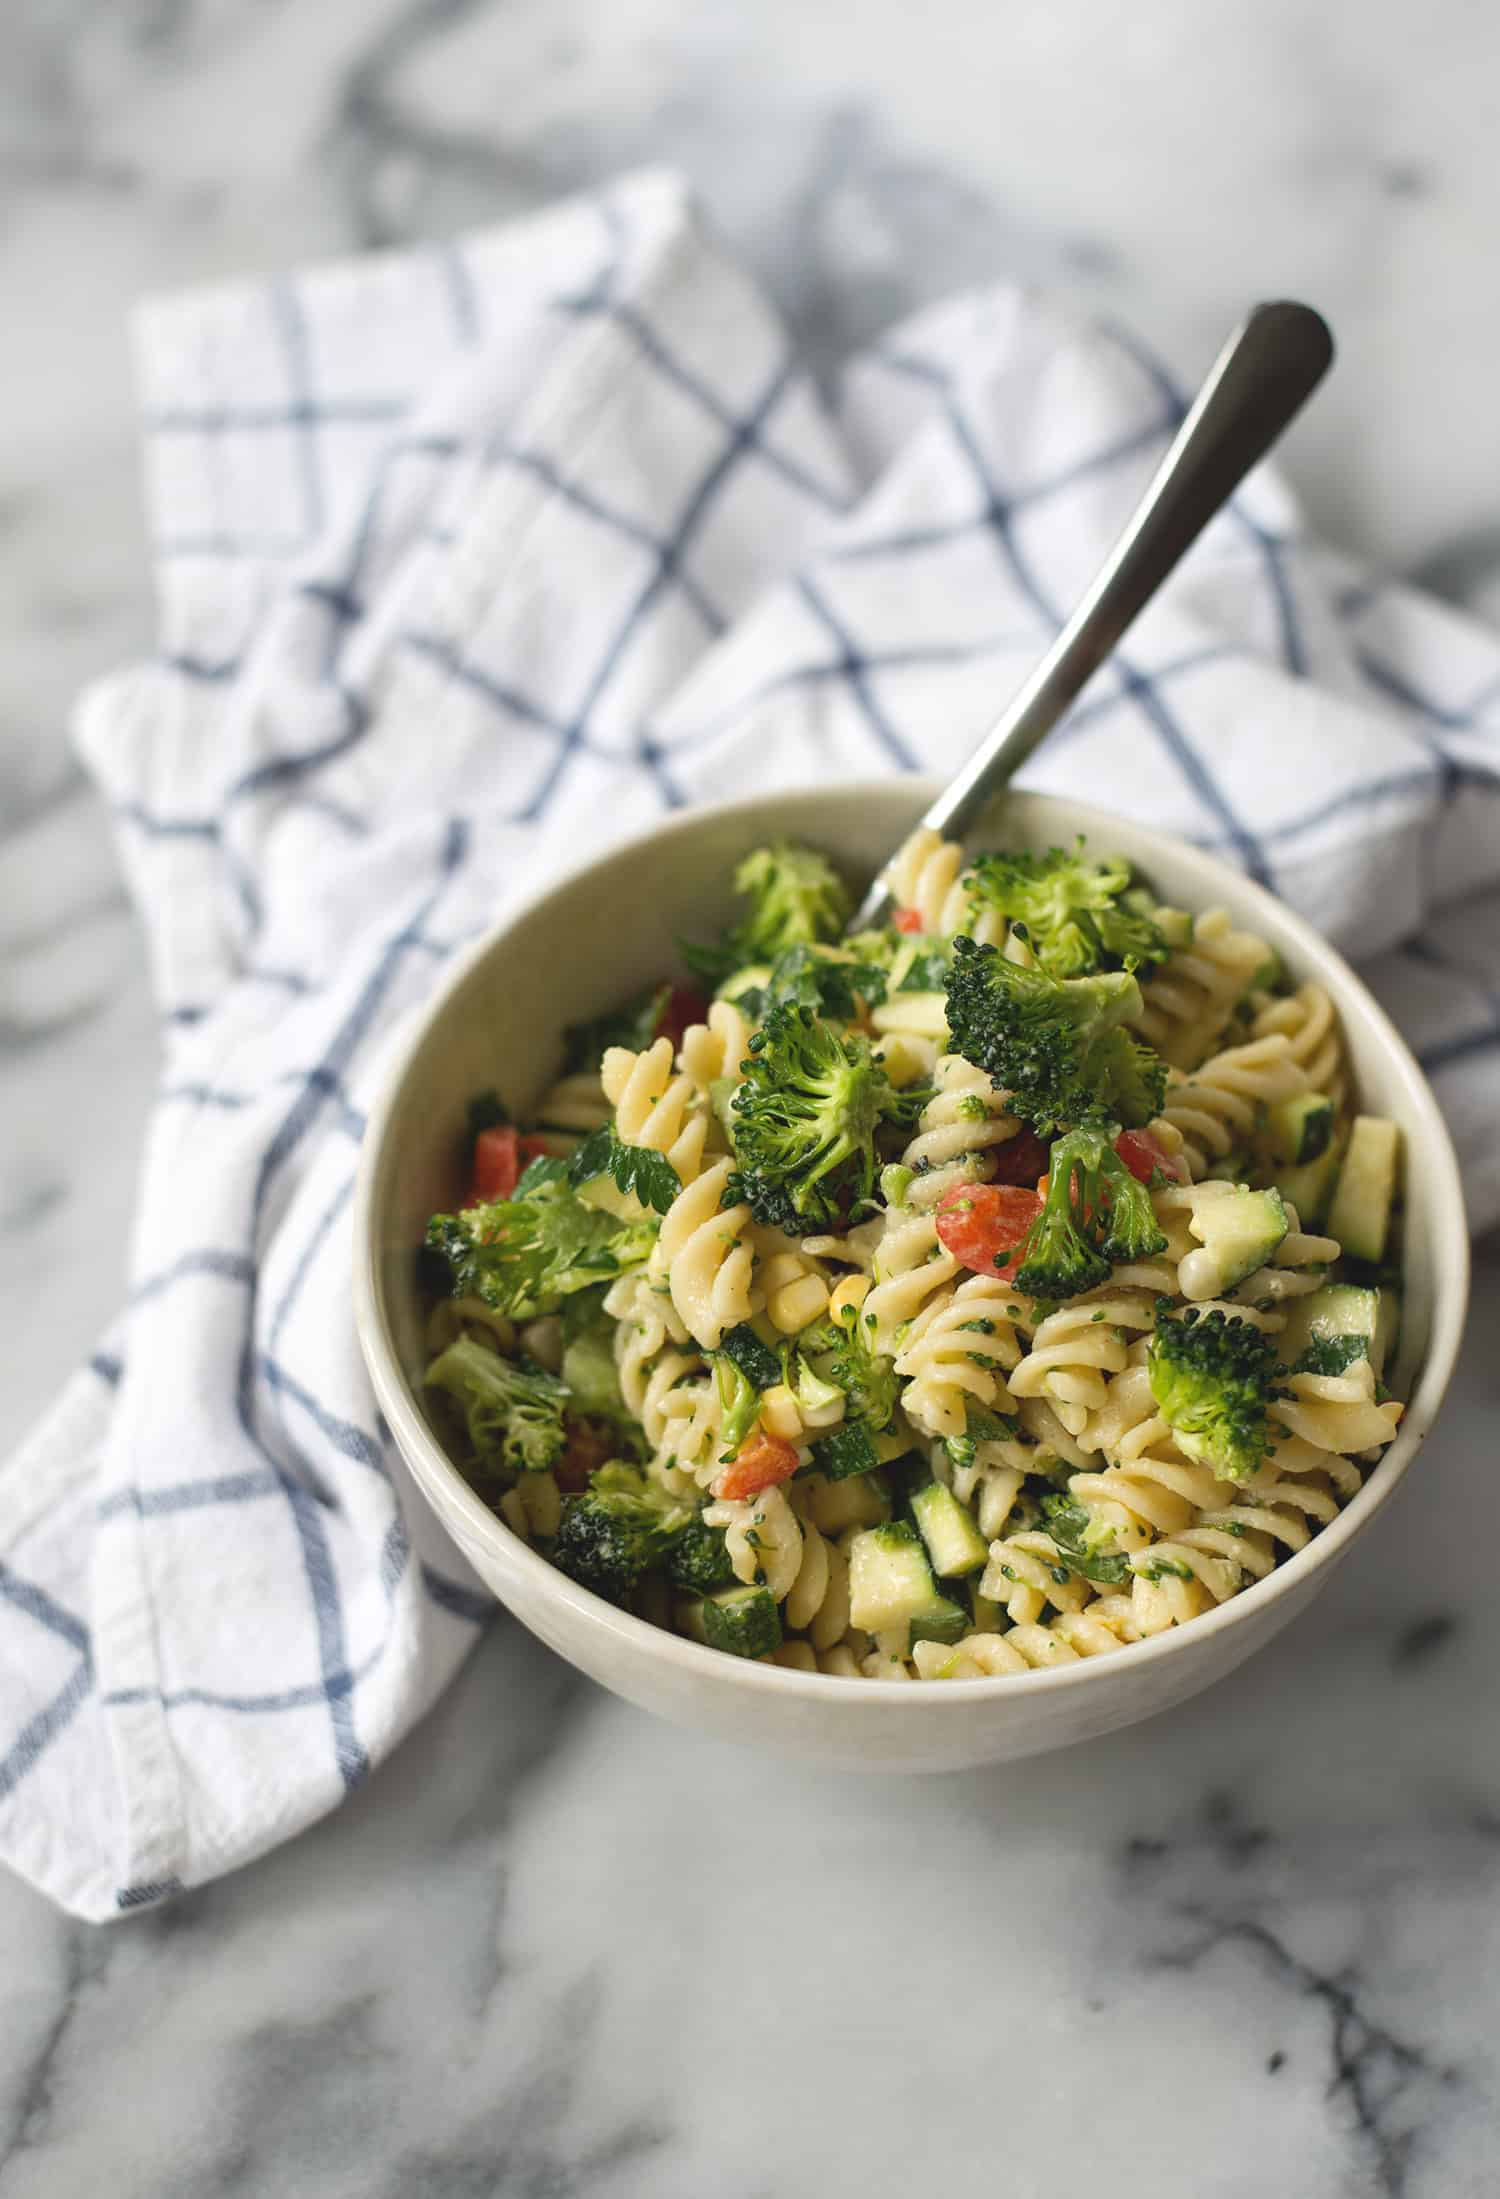 Summer Pasta Salad with Lemon-Tahini dressing! If you like Goddess salad dressing, you will love this salad! Noodles, four vegetables, tahini dressing, parsley and basil. Vegan | www.delishknowledge.com